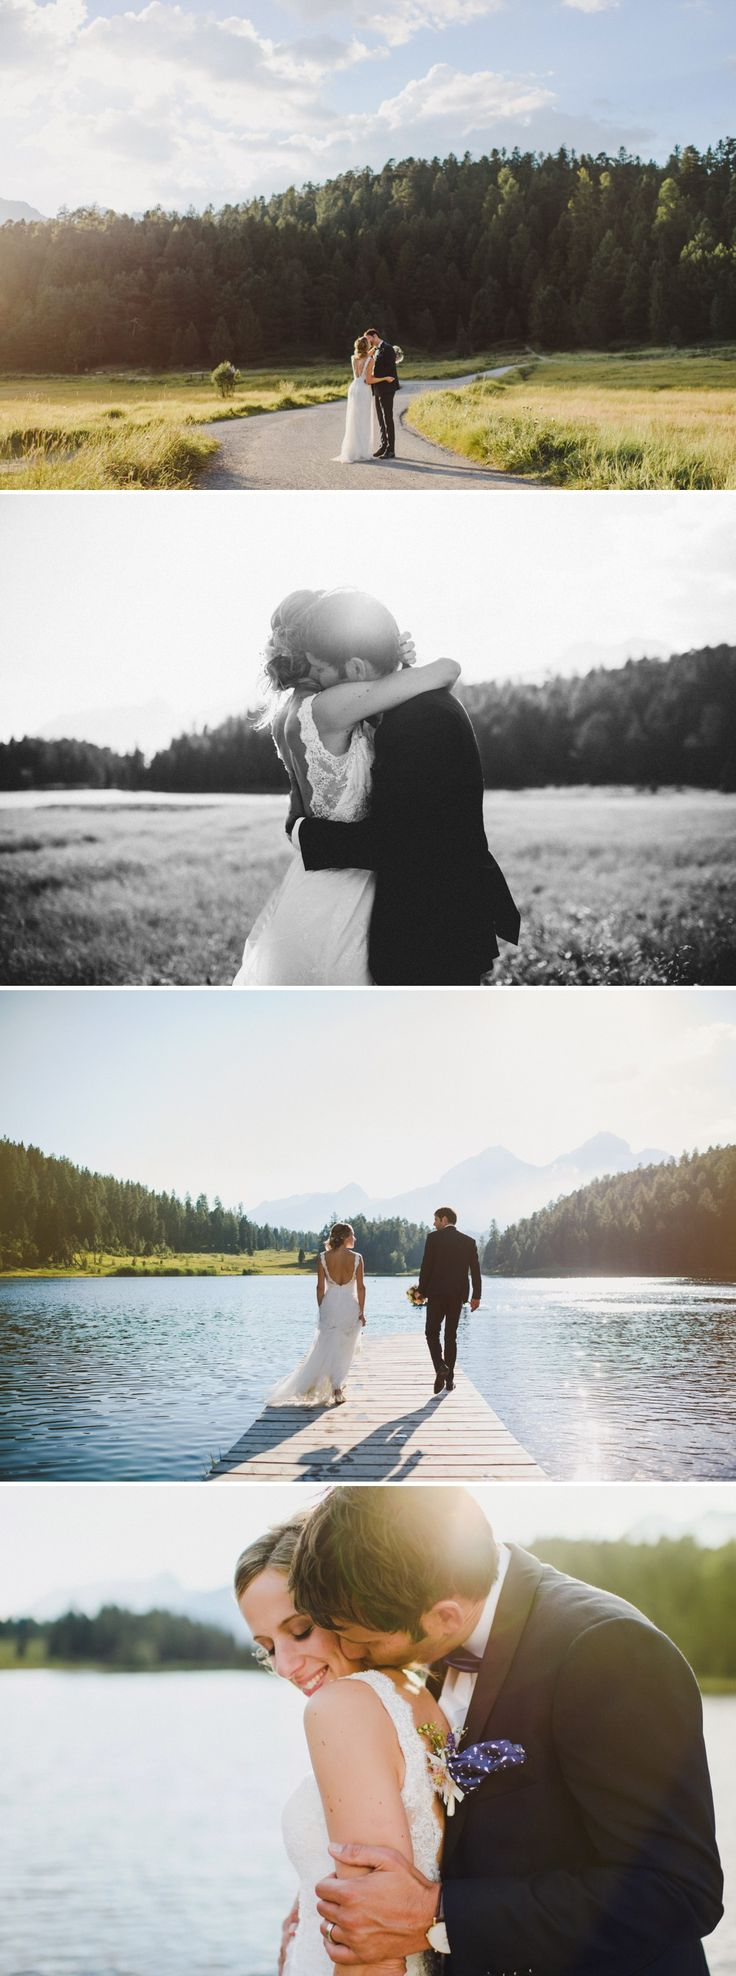 Swiss wedding, Swiss Wedding Photographer, Switzerland, Schweiz, Suisse, Mountain Wedding, St Moritz, Lej da Staz, Rustic, Natural Light